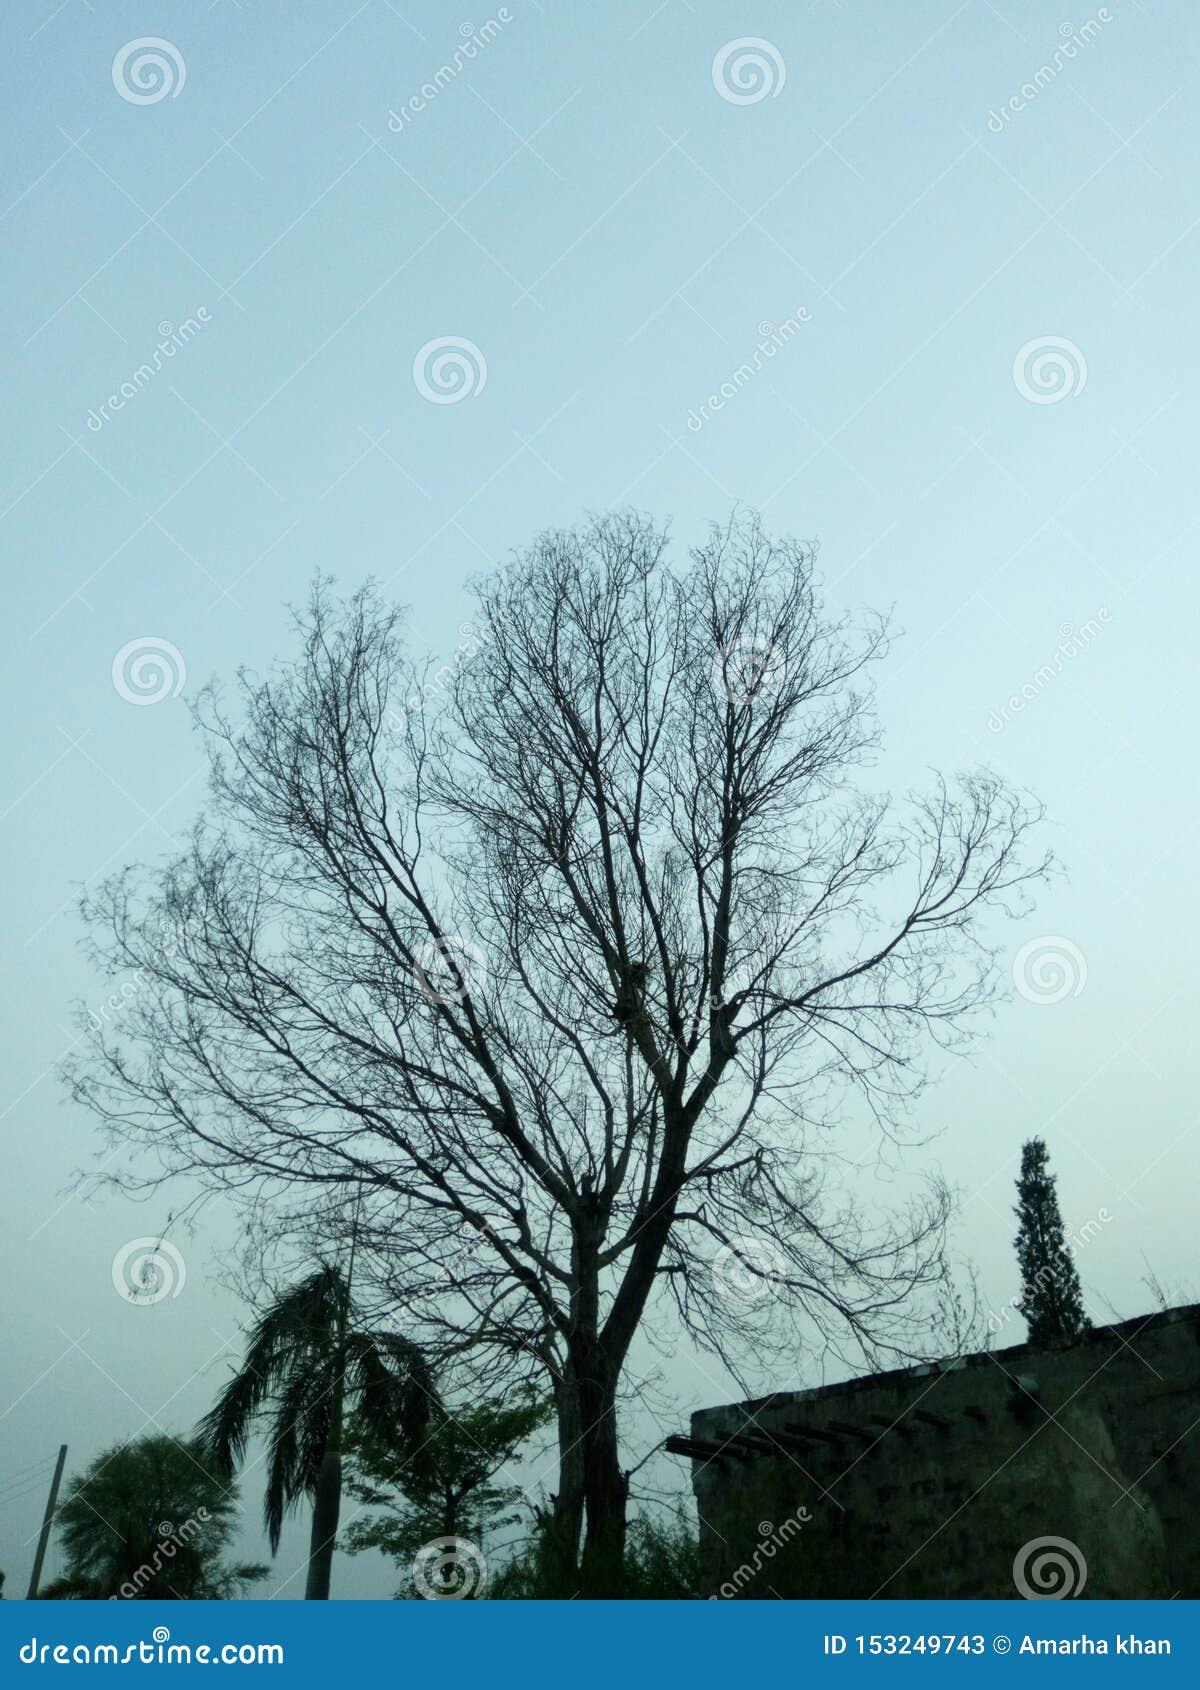 Nyctophilia Stock Image Image Of Nyctophilia Tree 153249743